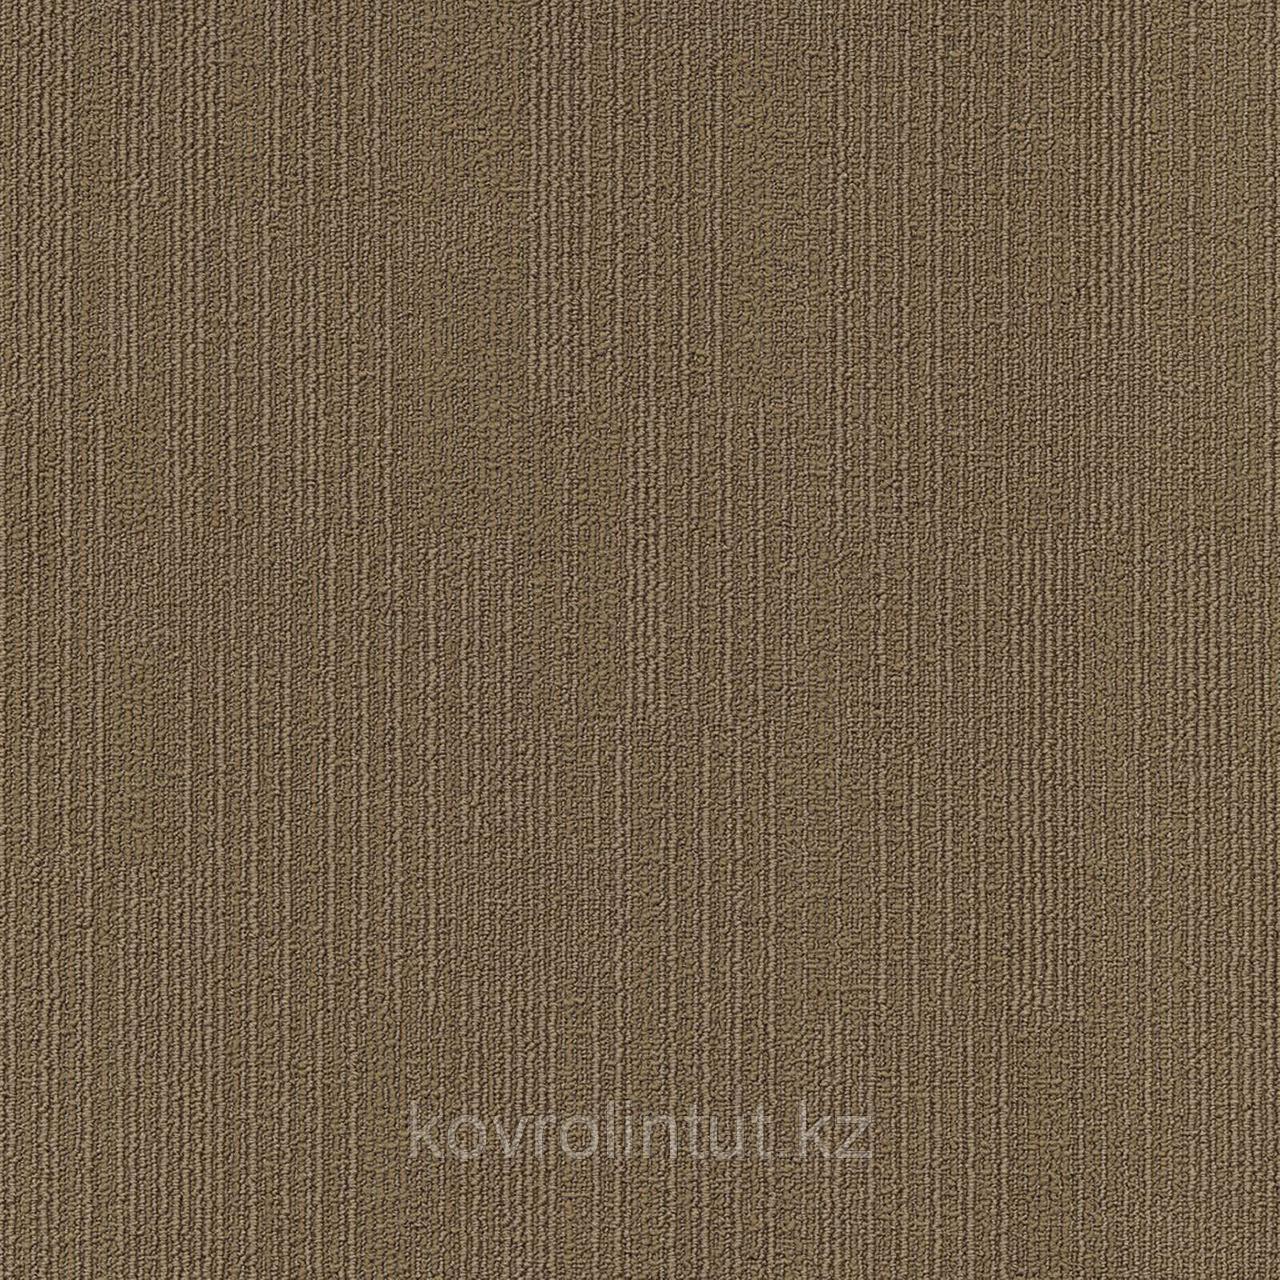 Плитка ковровая Modulyss Fashion& 206, 100% PA